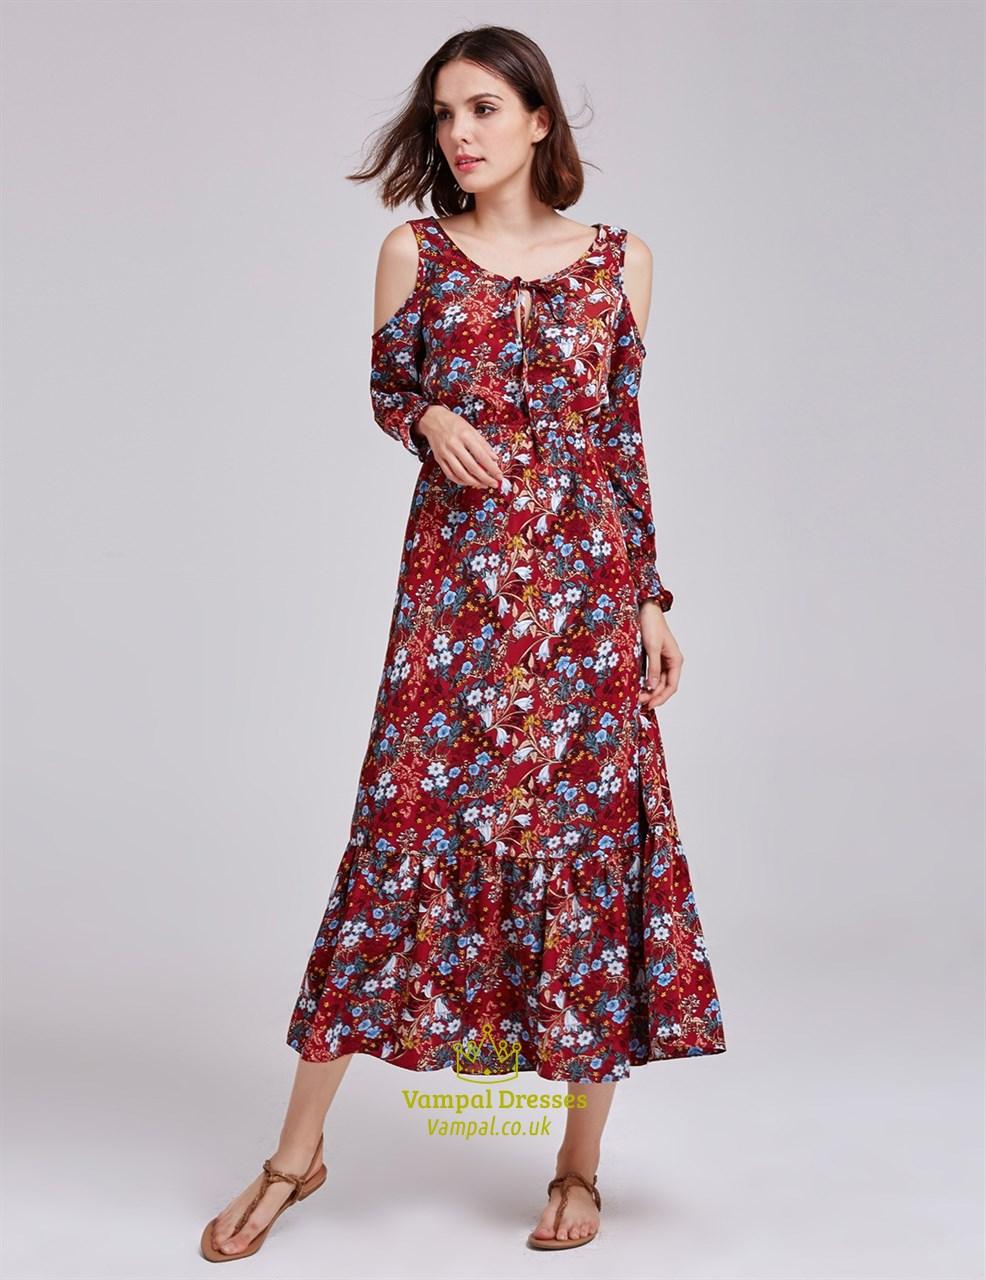 Tea Length Scoop Neckline A Line Floral Print Dress With